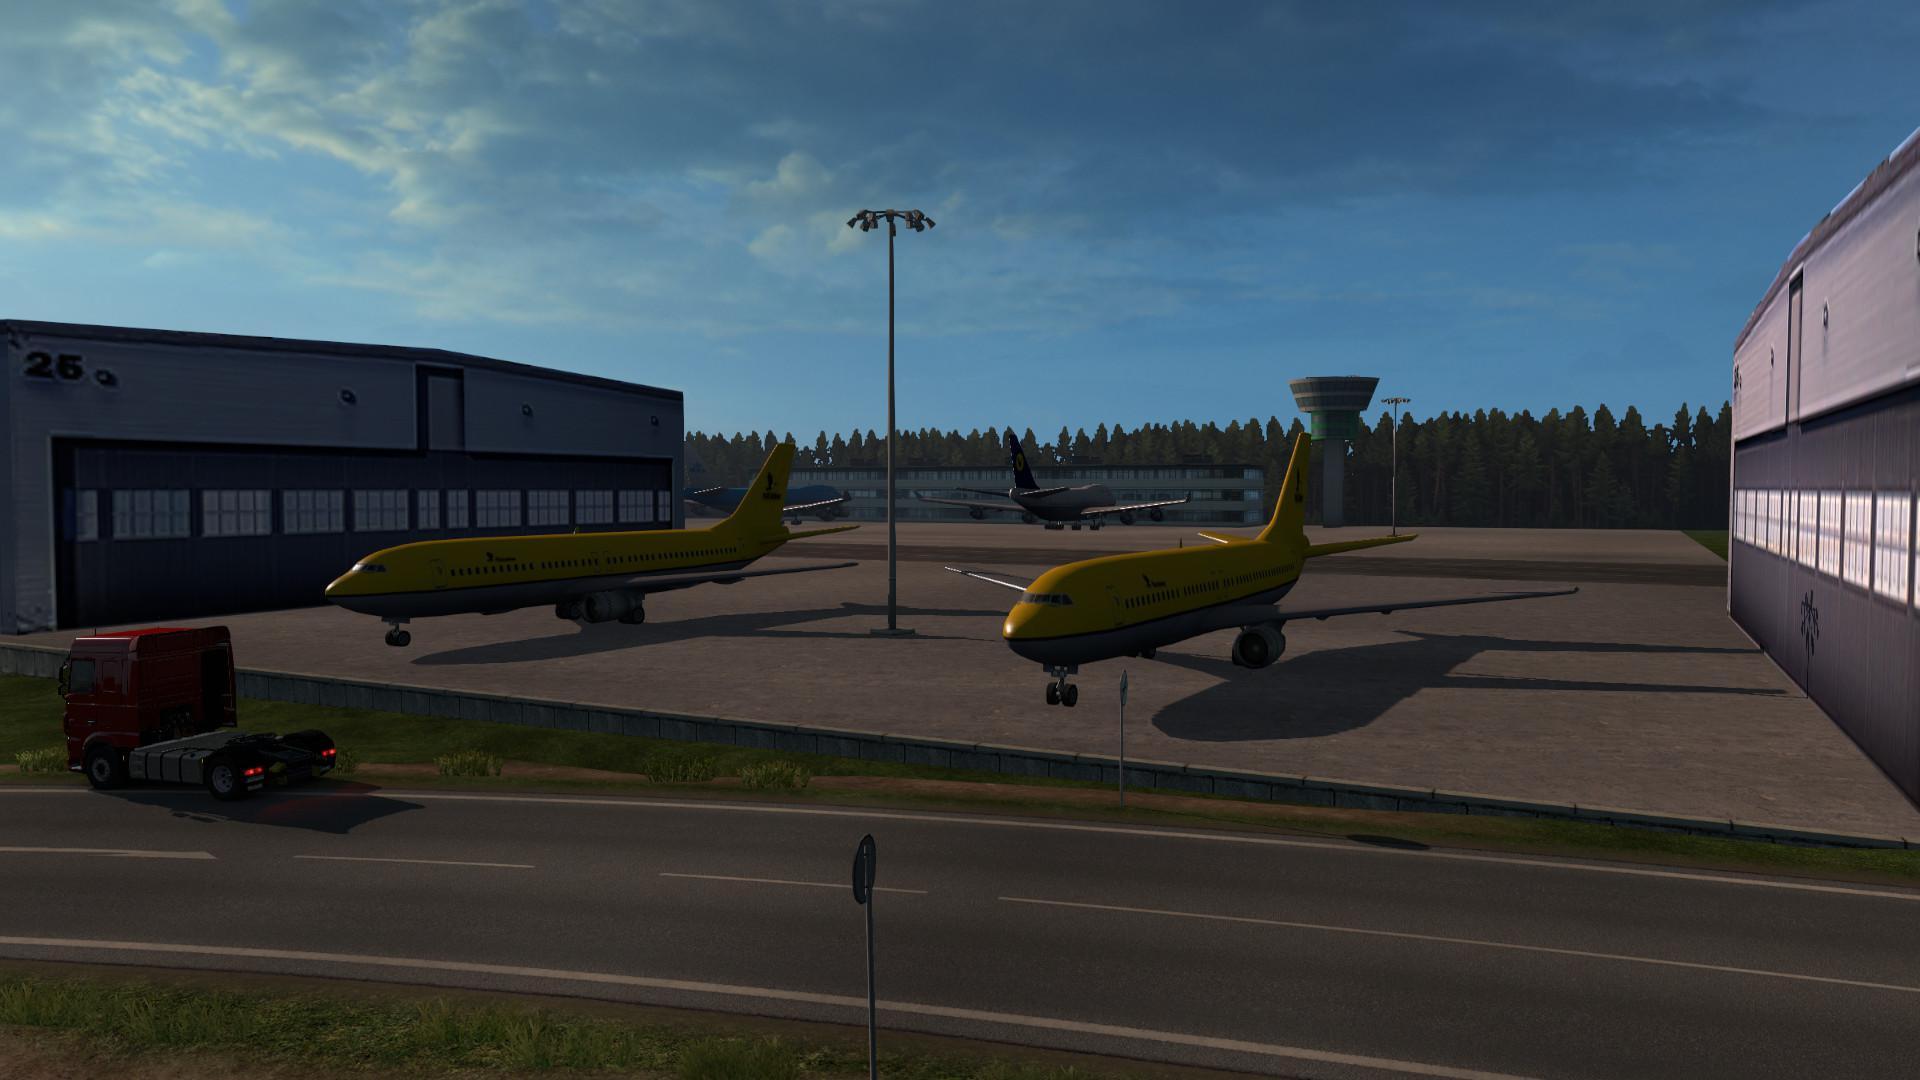 Ets2 Leipzig Halle Airport V1 1 1 37 X Euro Truck Simulator 2 Mods Club